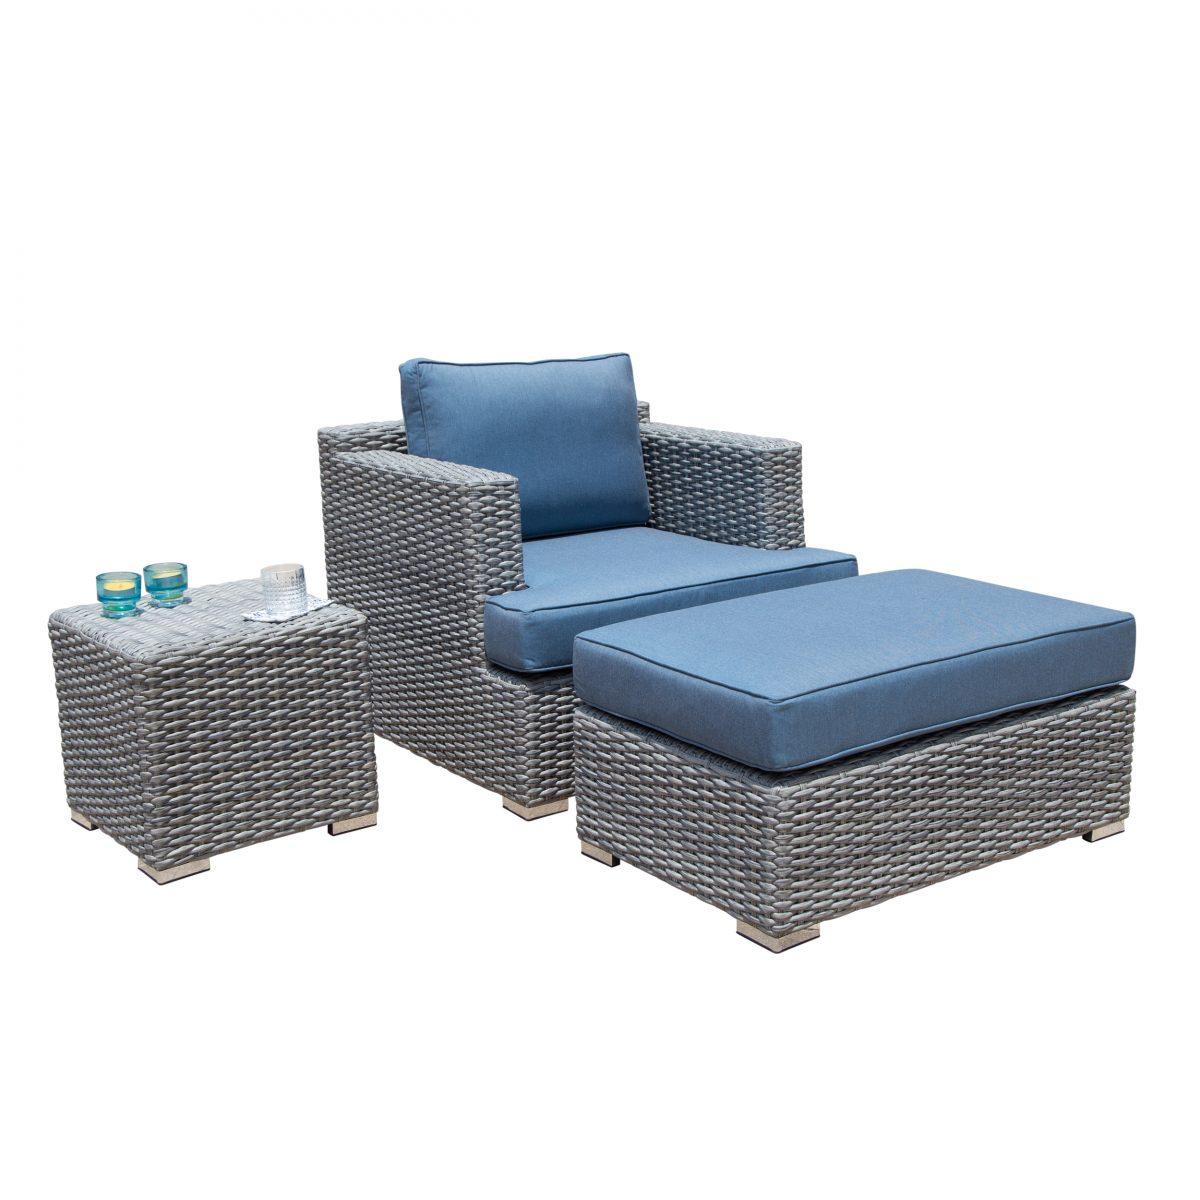 borealis niko 3 piece ash grey and denim club chair set